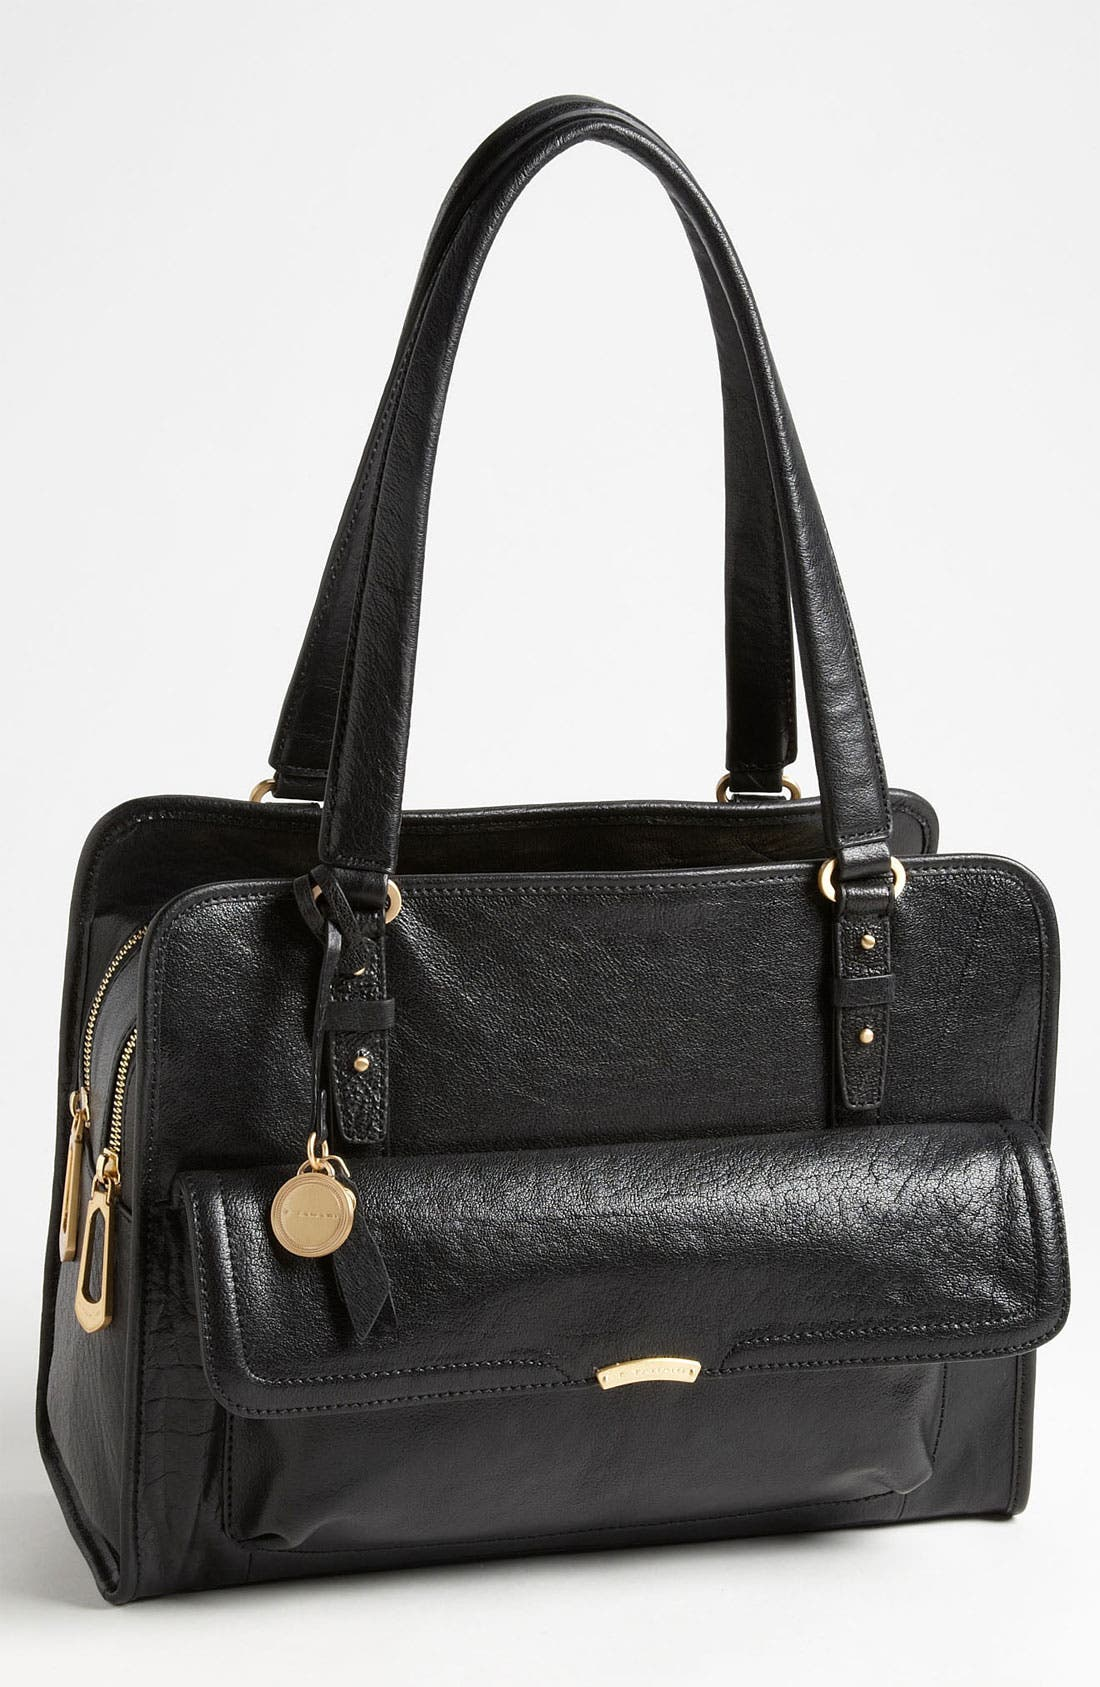 Main Image - T Tahari 'Joy' Double Compartment Shoulder Bag